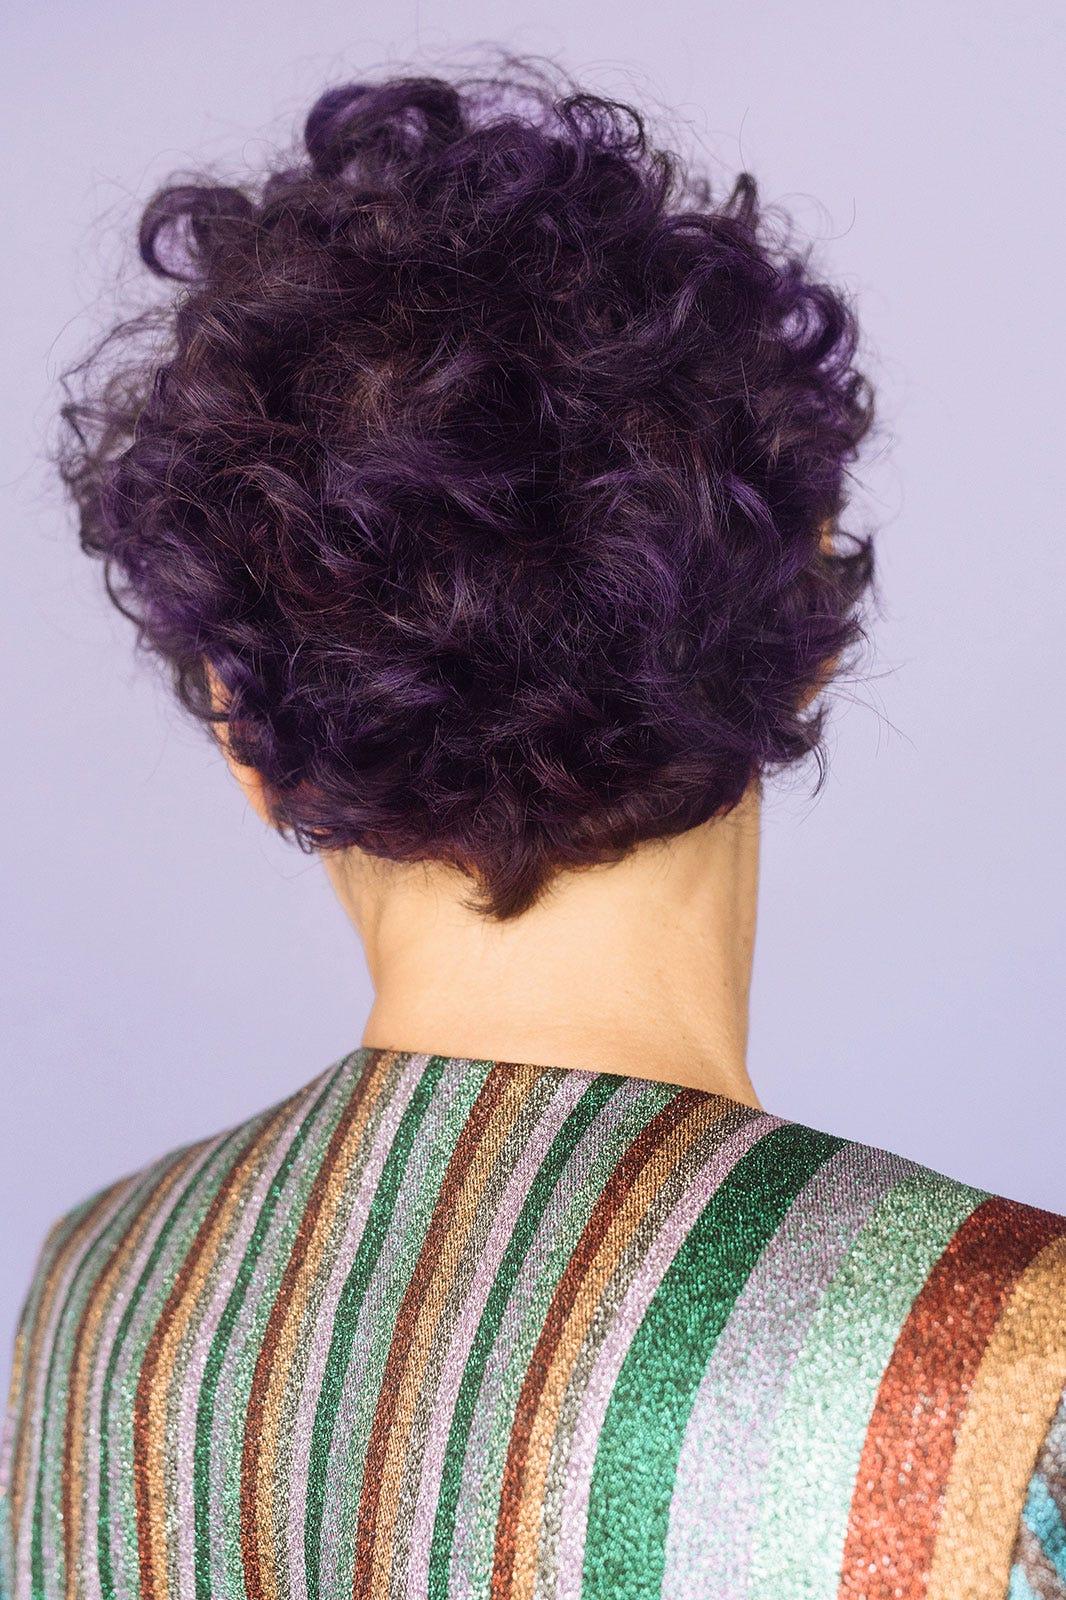 Hair Dye For Older Women Hair Dyeing Colors